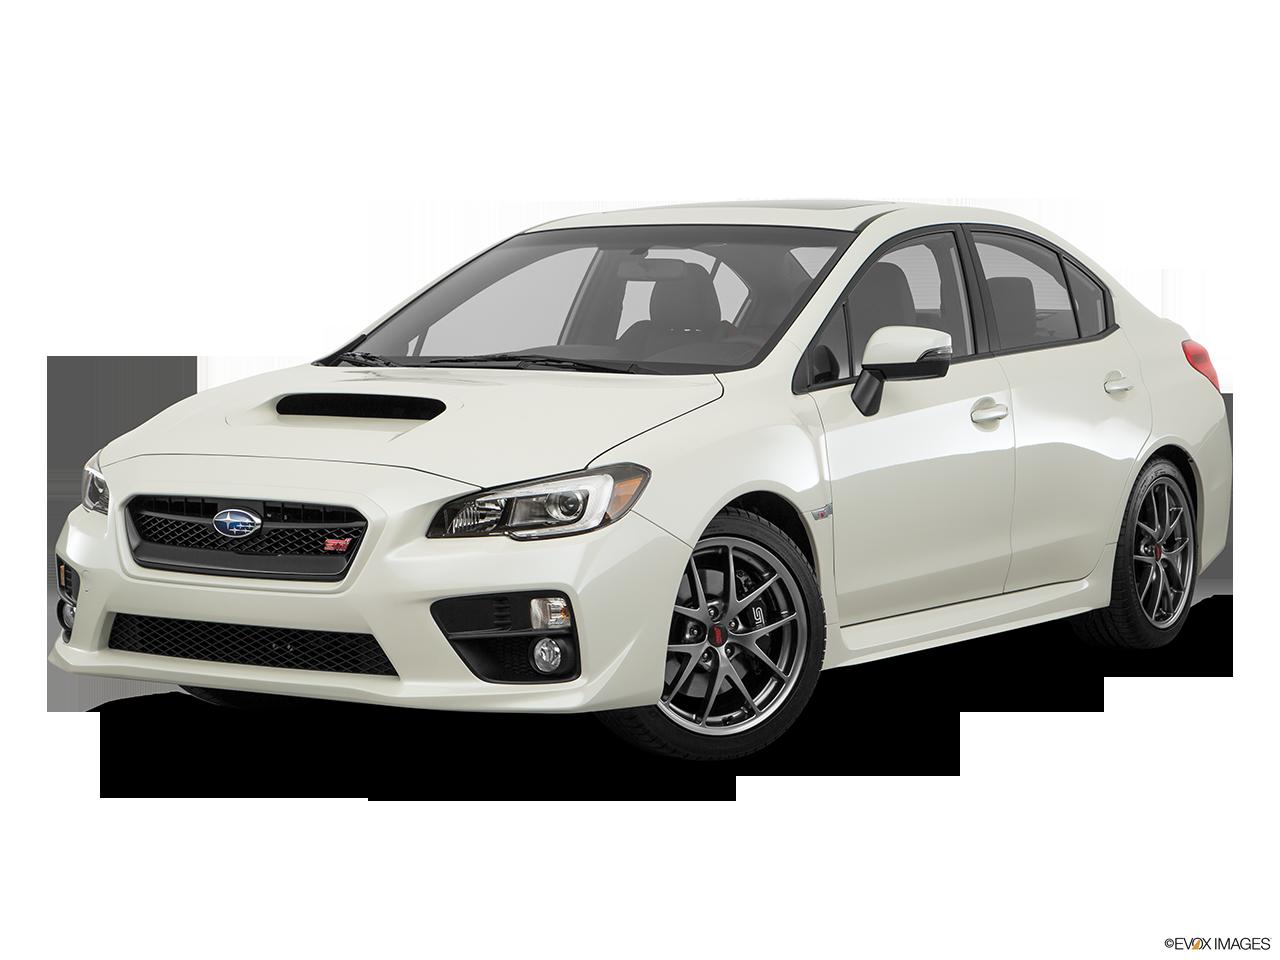 Test Drive A 2017 Subaru WRX at Galpin Subaru in Los Angeles